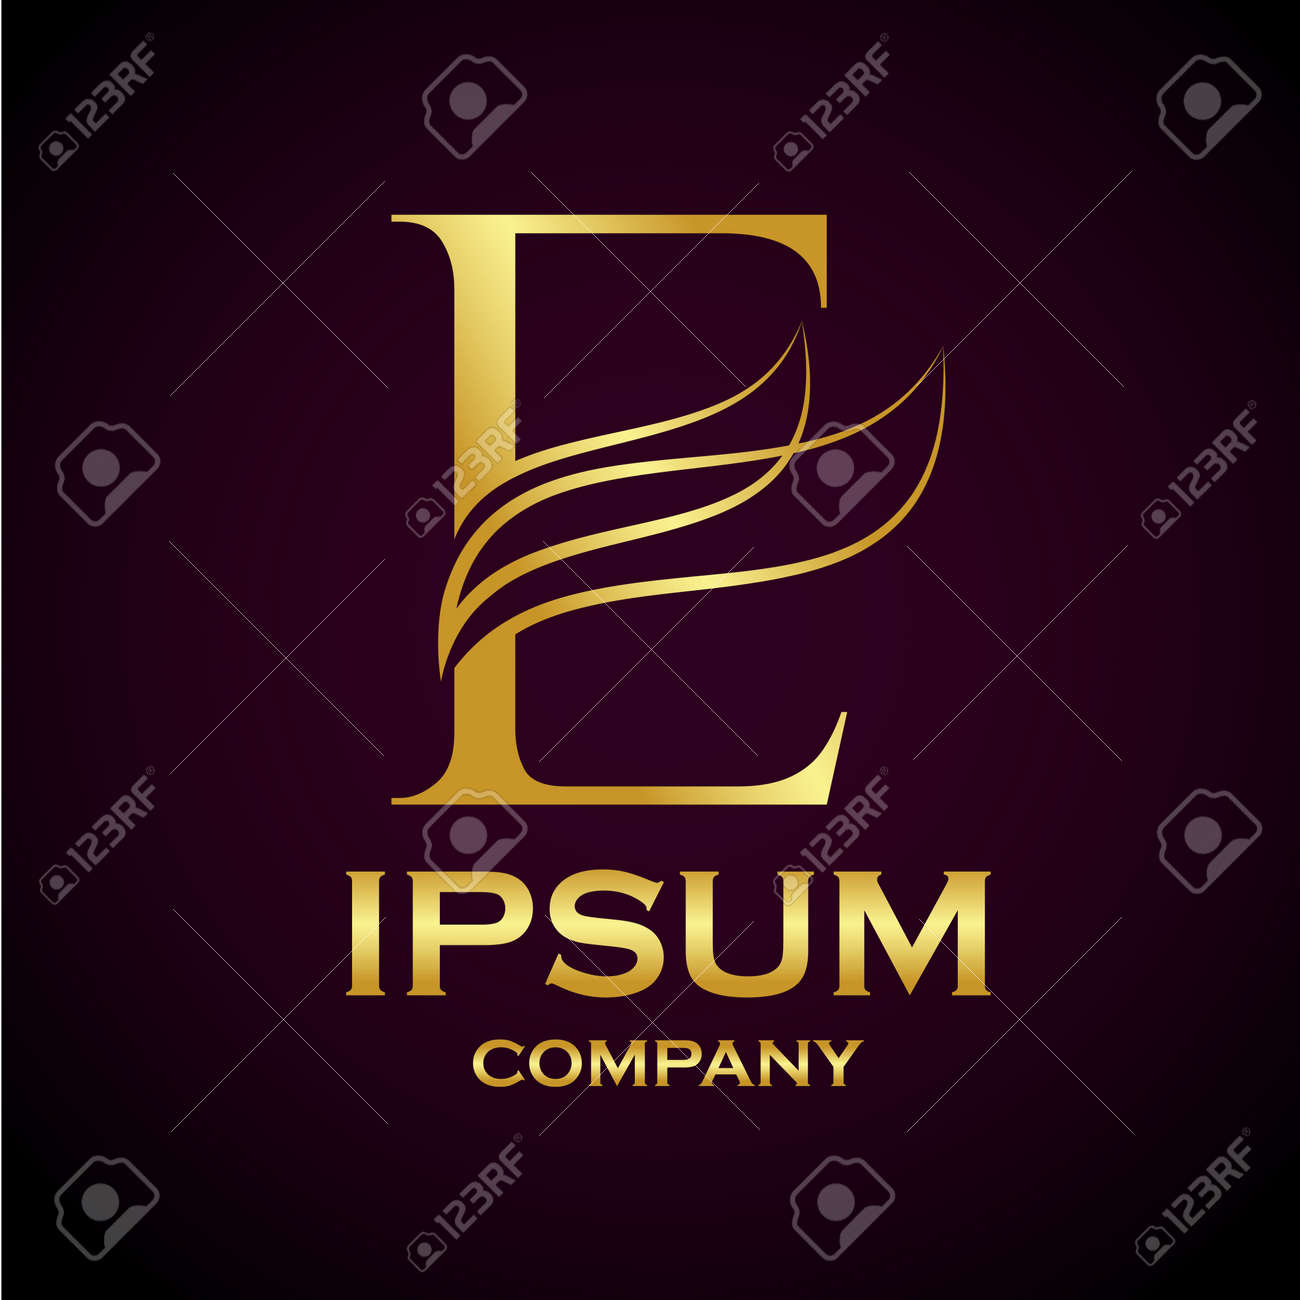 Abstract letter e logo designgold beauty industry and fashion abstract letter e logo designgold beauty industry and fashion logosmetics business altavistaventures Images